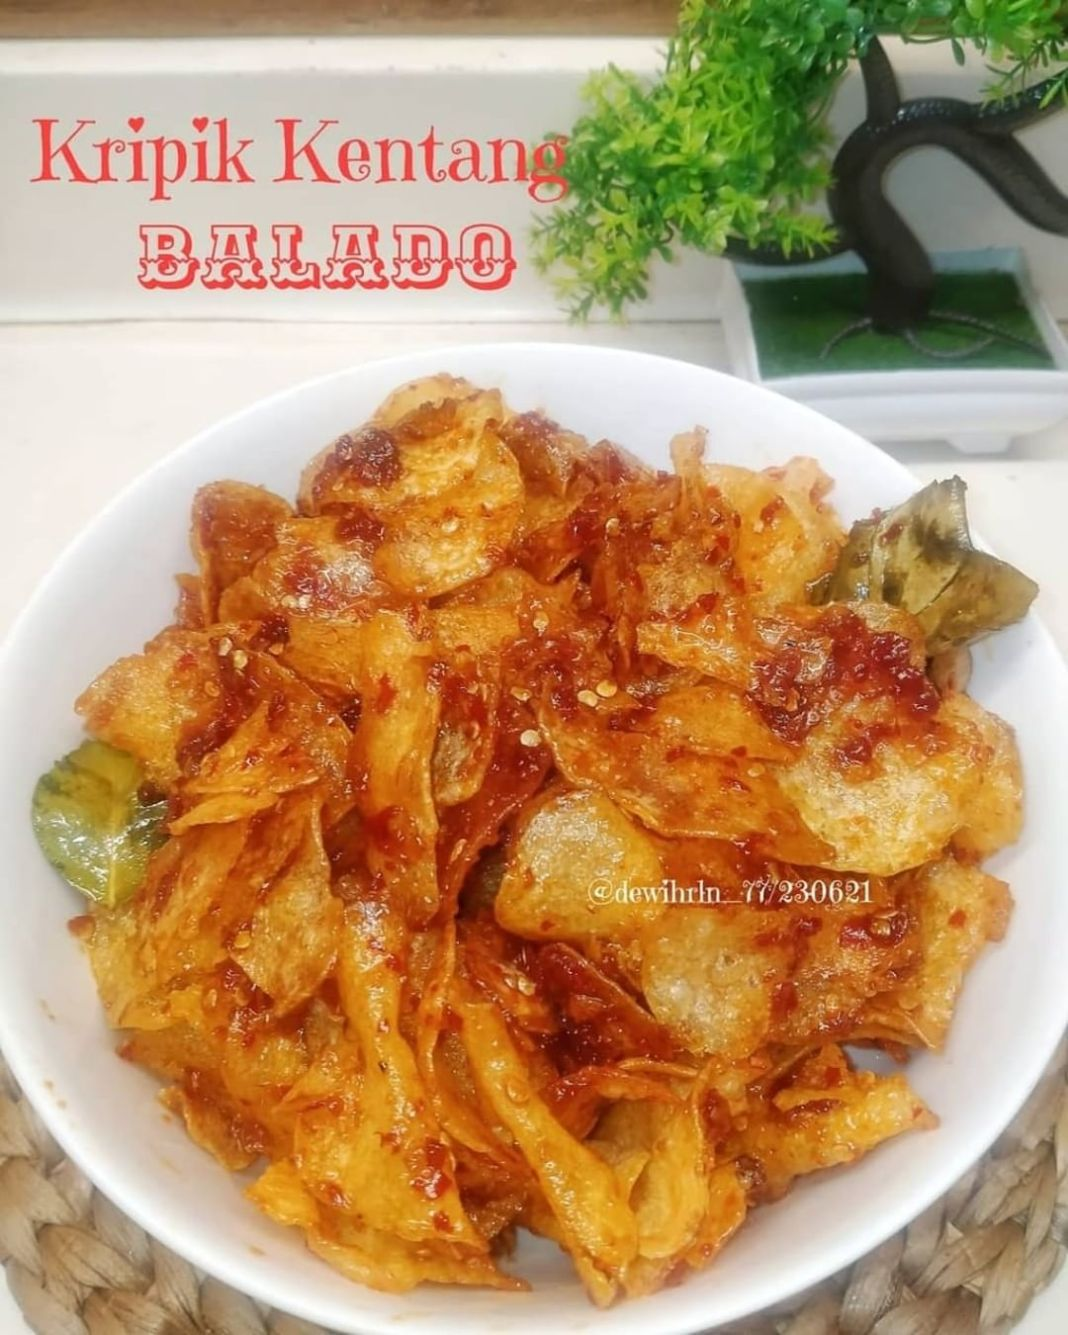 Info kuliner, Keripik Kentang Balado  By :dewihrln_77  Bahan bahan :  Kentang 1 kg 2 sdm air asam Jawa 2 lem…